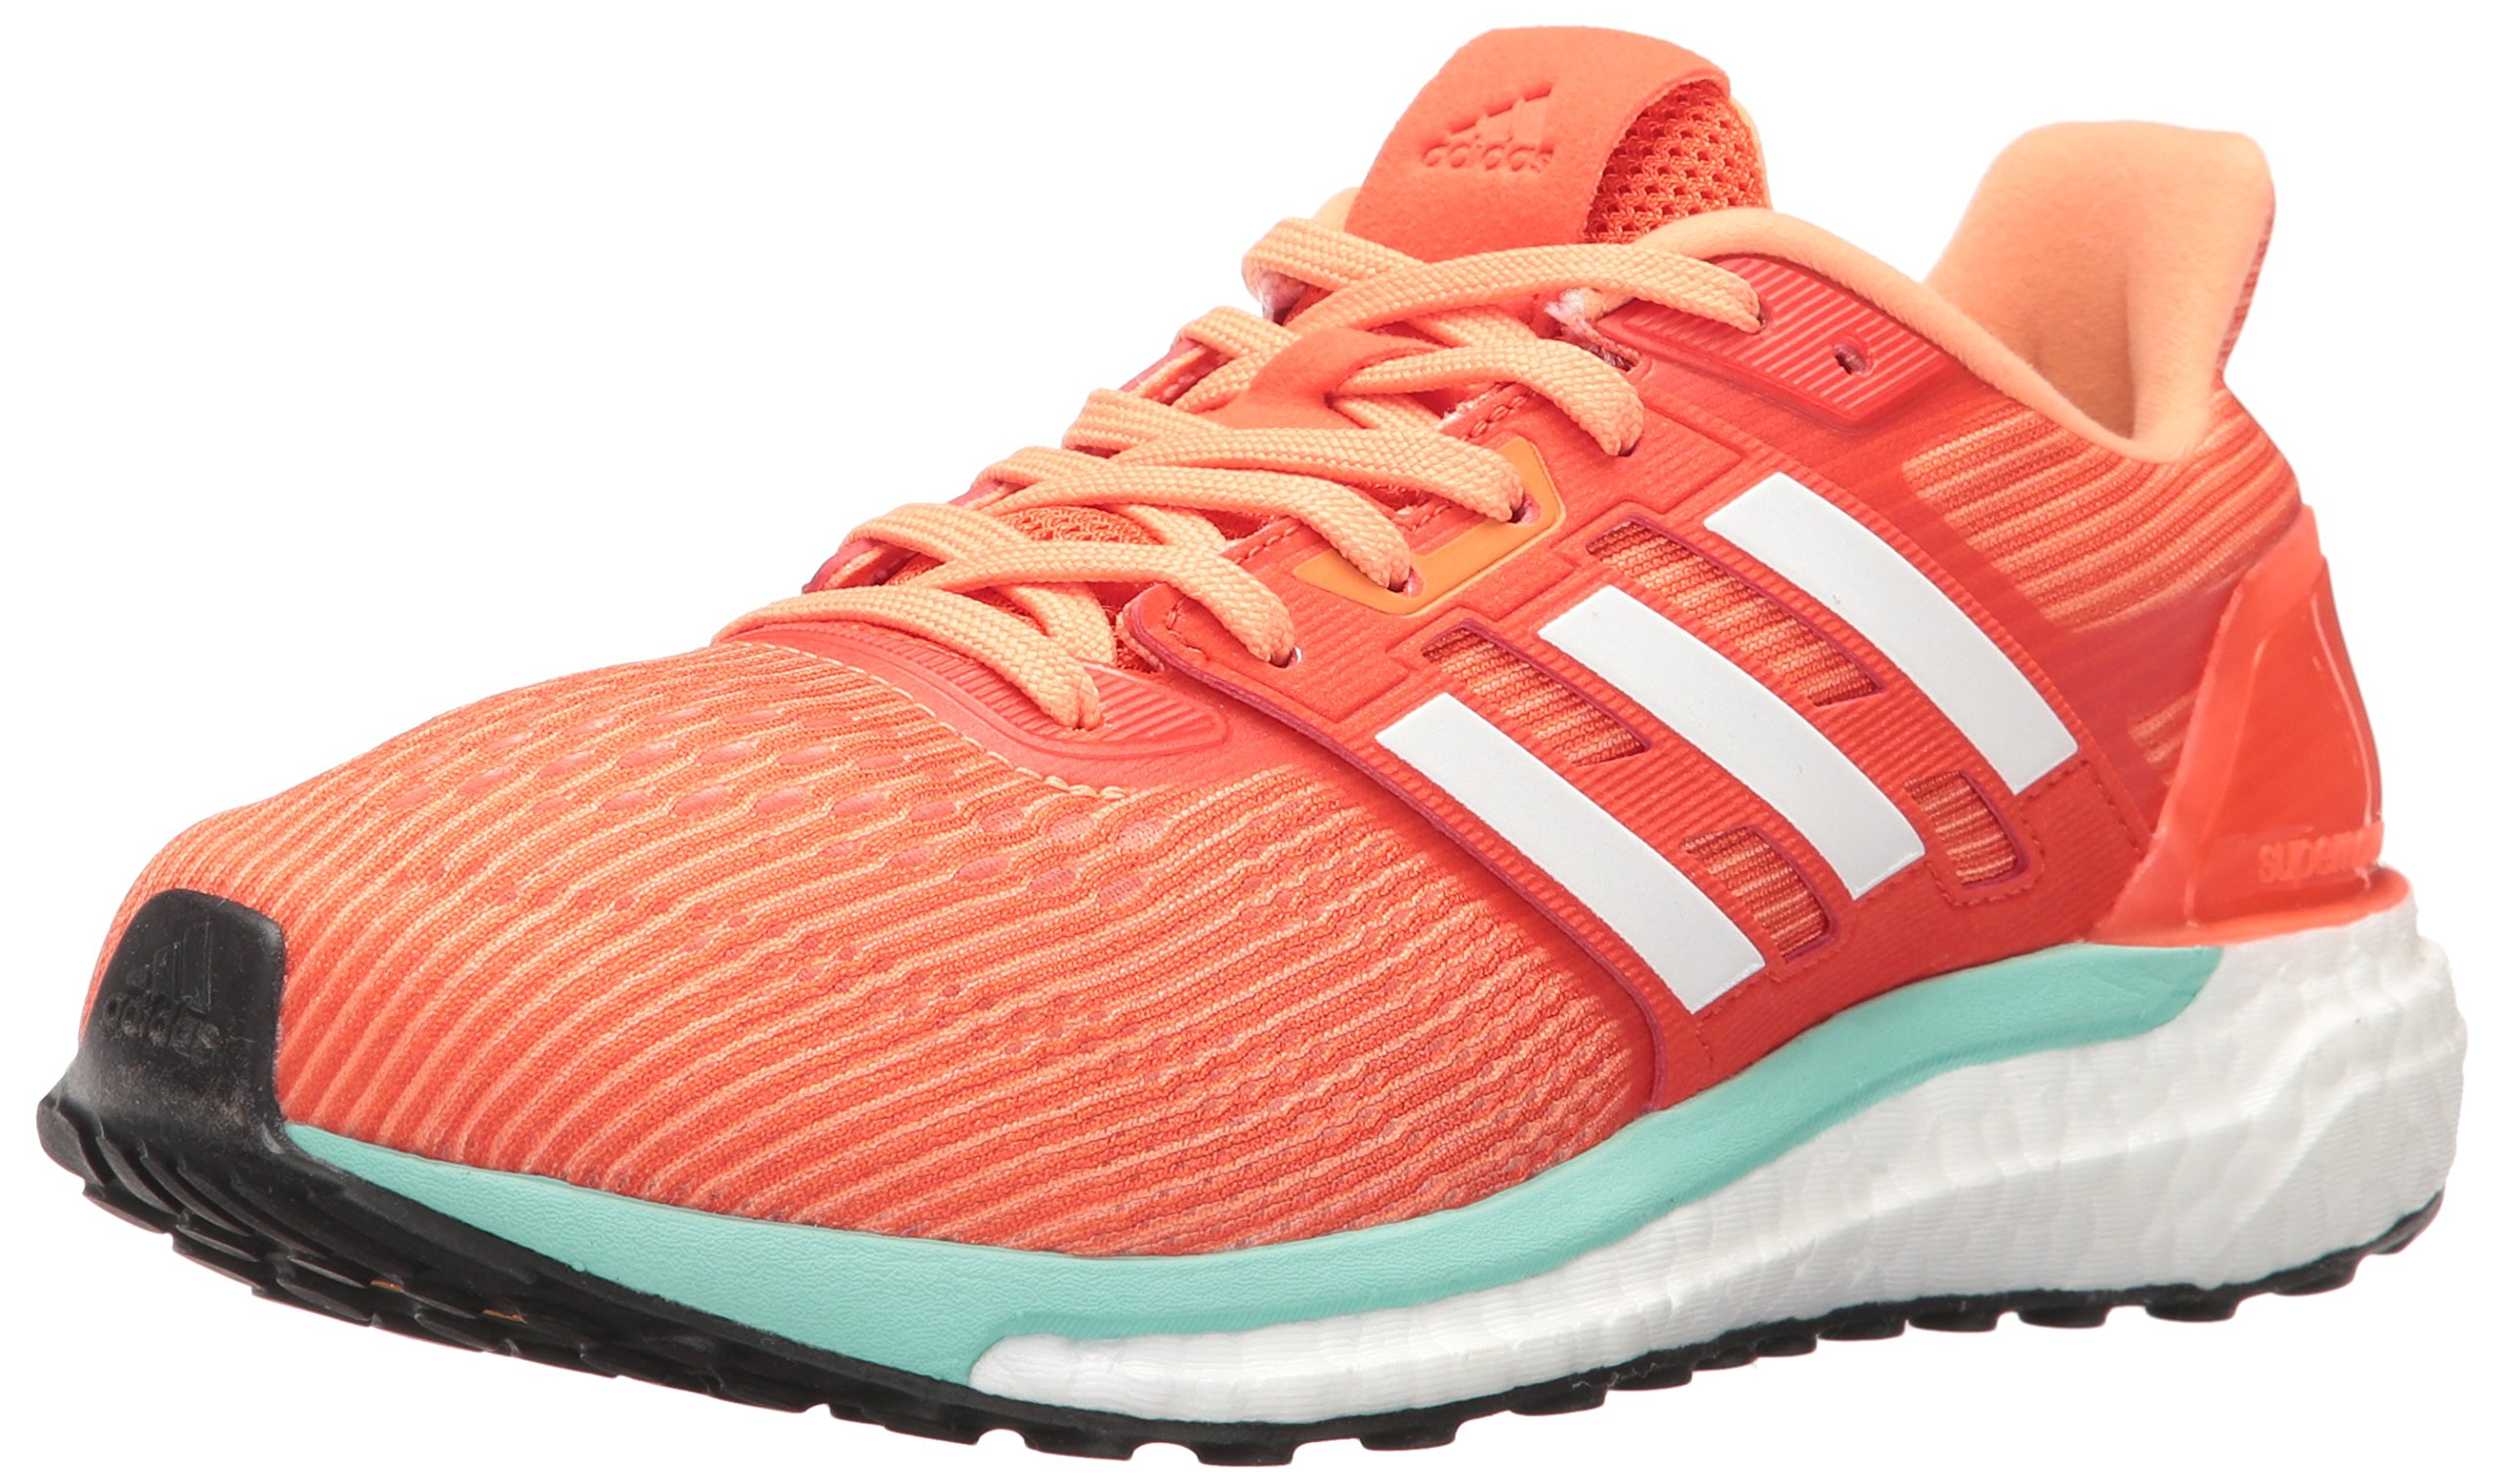 adidas Women's Supernova w Running Shoe, Energy